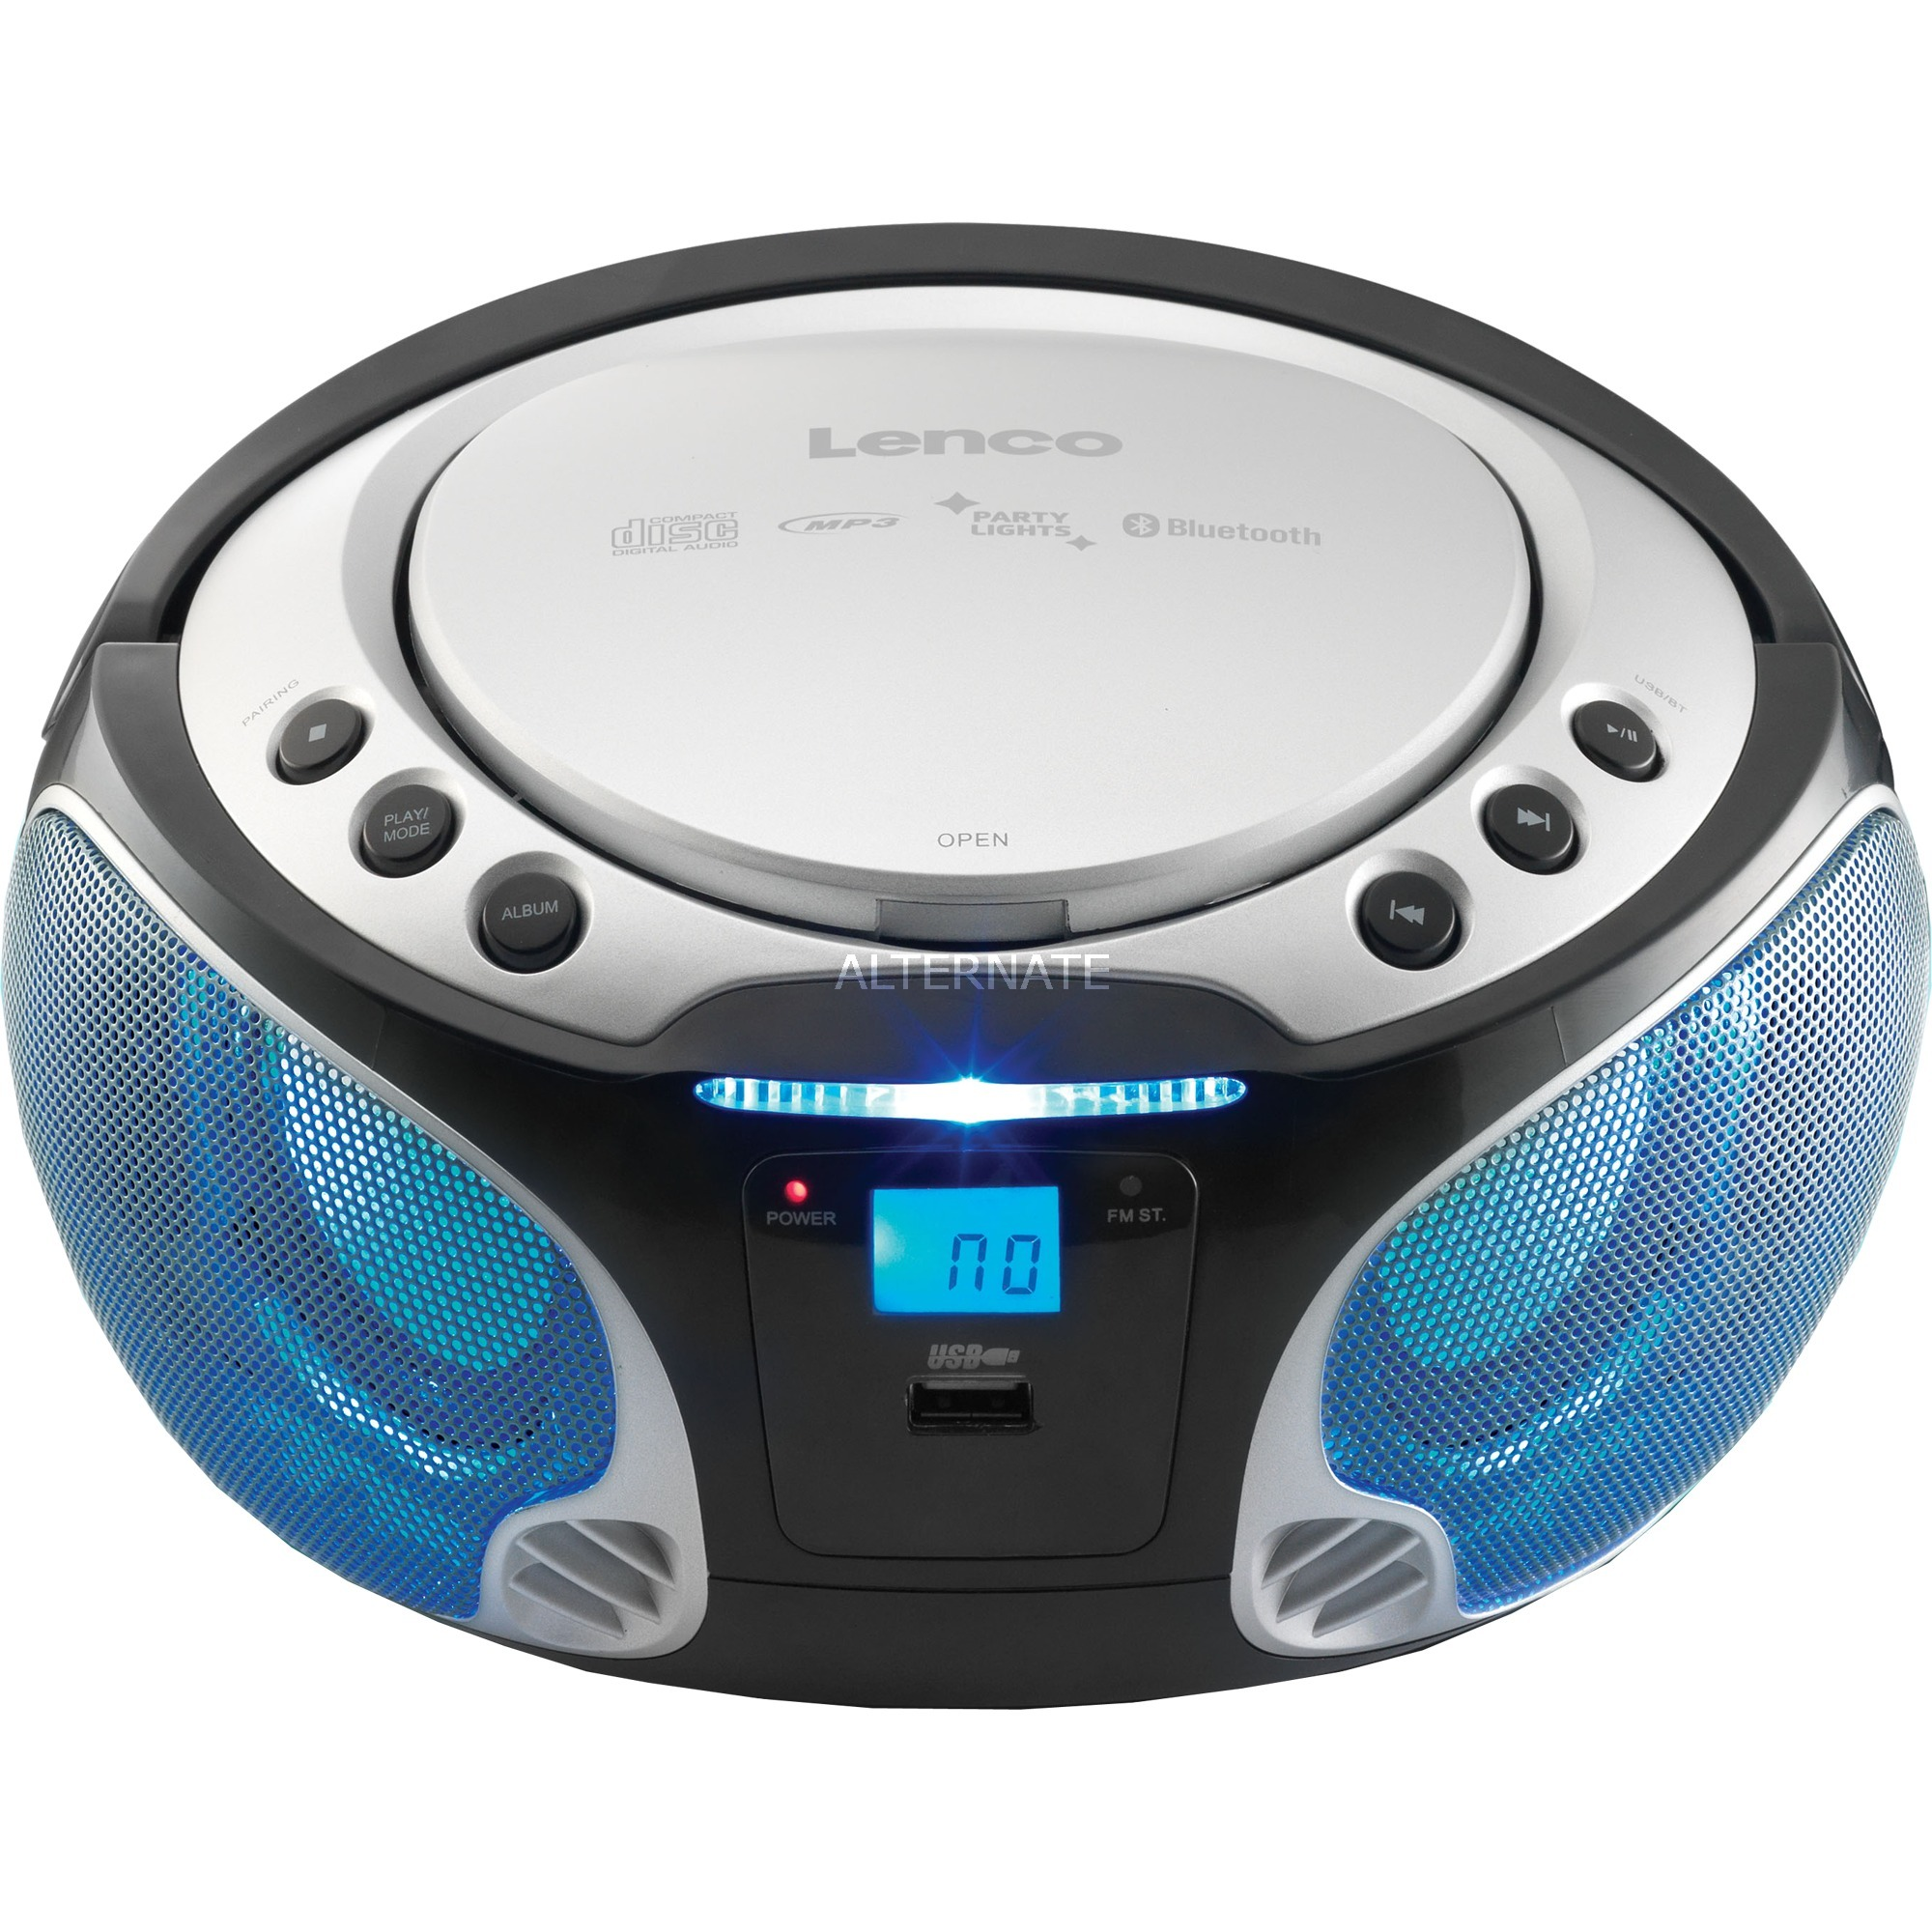 Nieuw Lenco Radio CD/MP3 speler SCD-550 compact systeem Zilver, Bluetooth AK-06